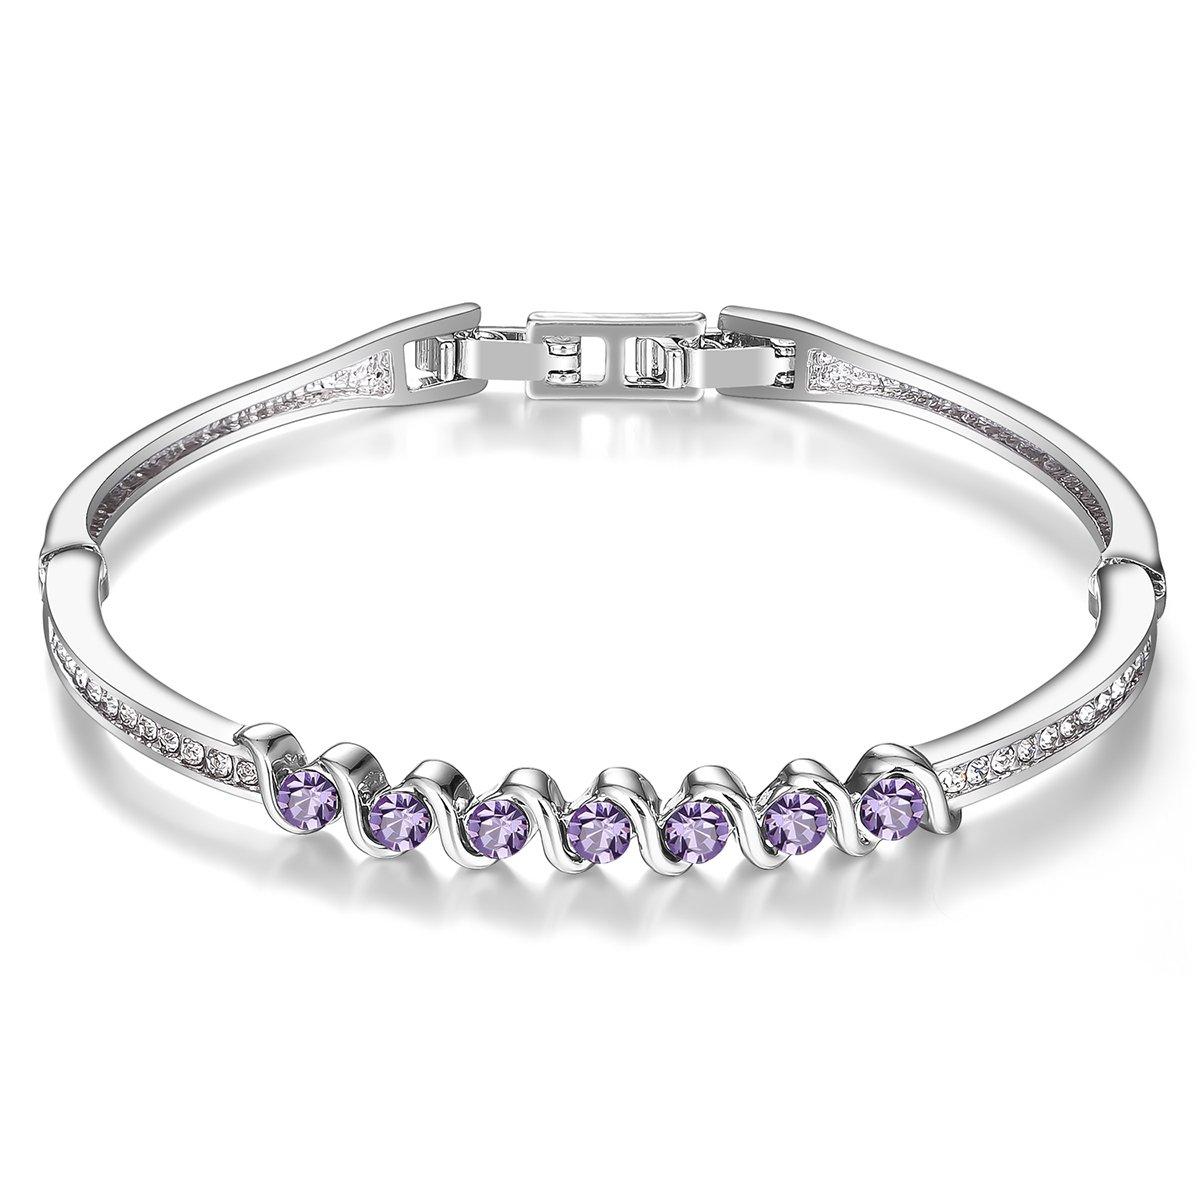 Menton Ezil 925 Silver Plated Swarovski Bracelets with Purple Amethyst Round Shape Stones Charming Jewelry for Wedding Gift by Menton Ezil